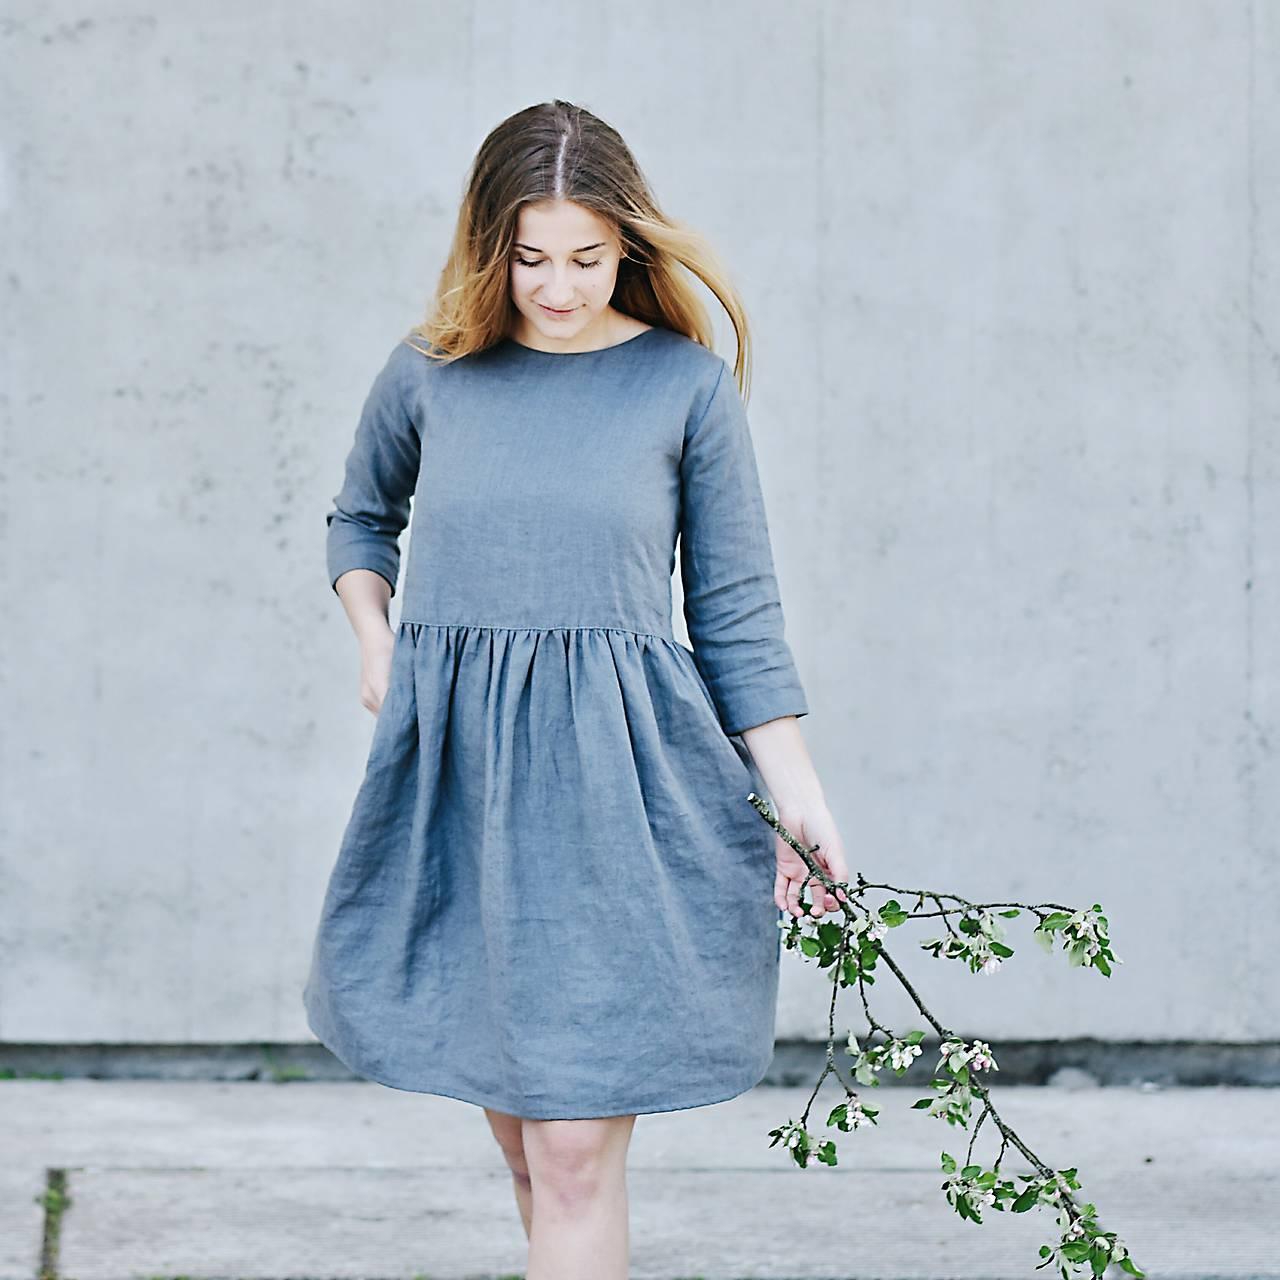 Dámske ľanové šaty 3/4 rukáv